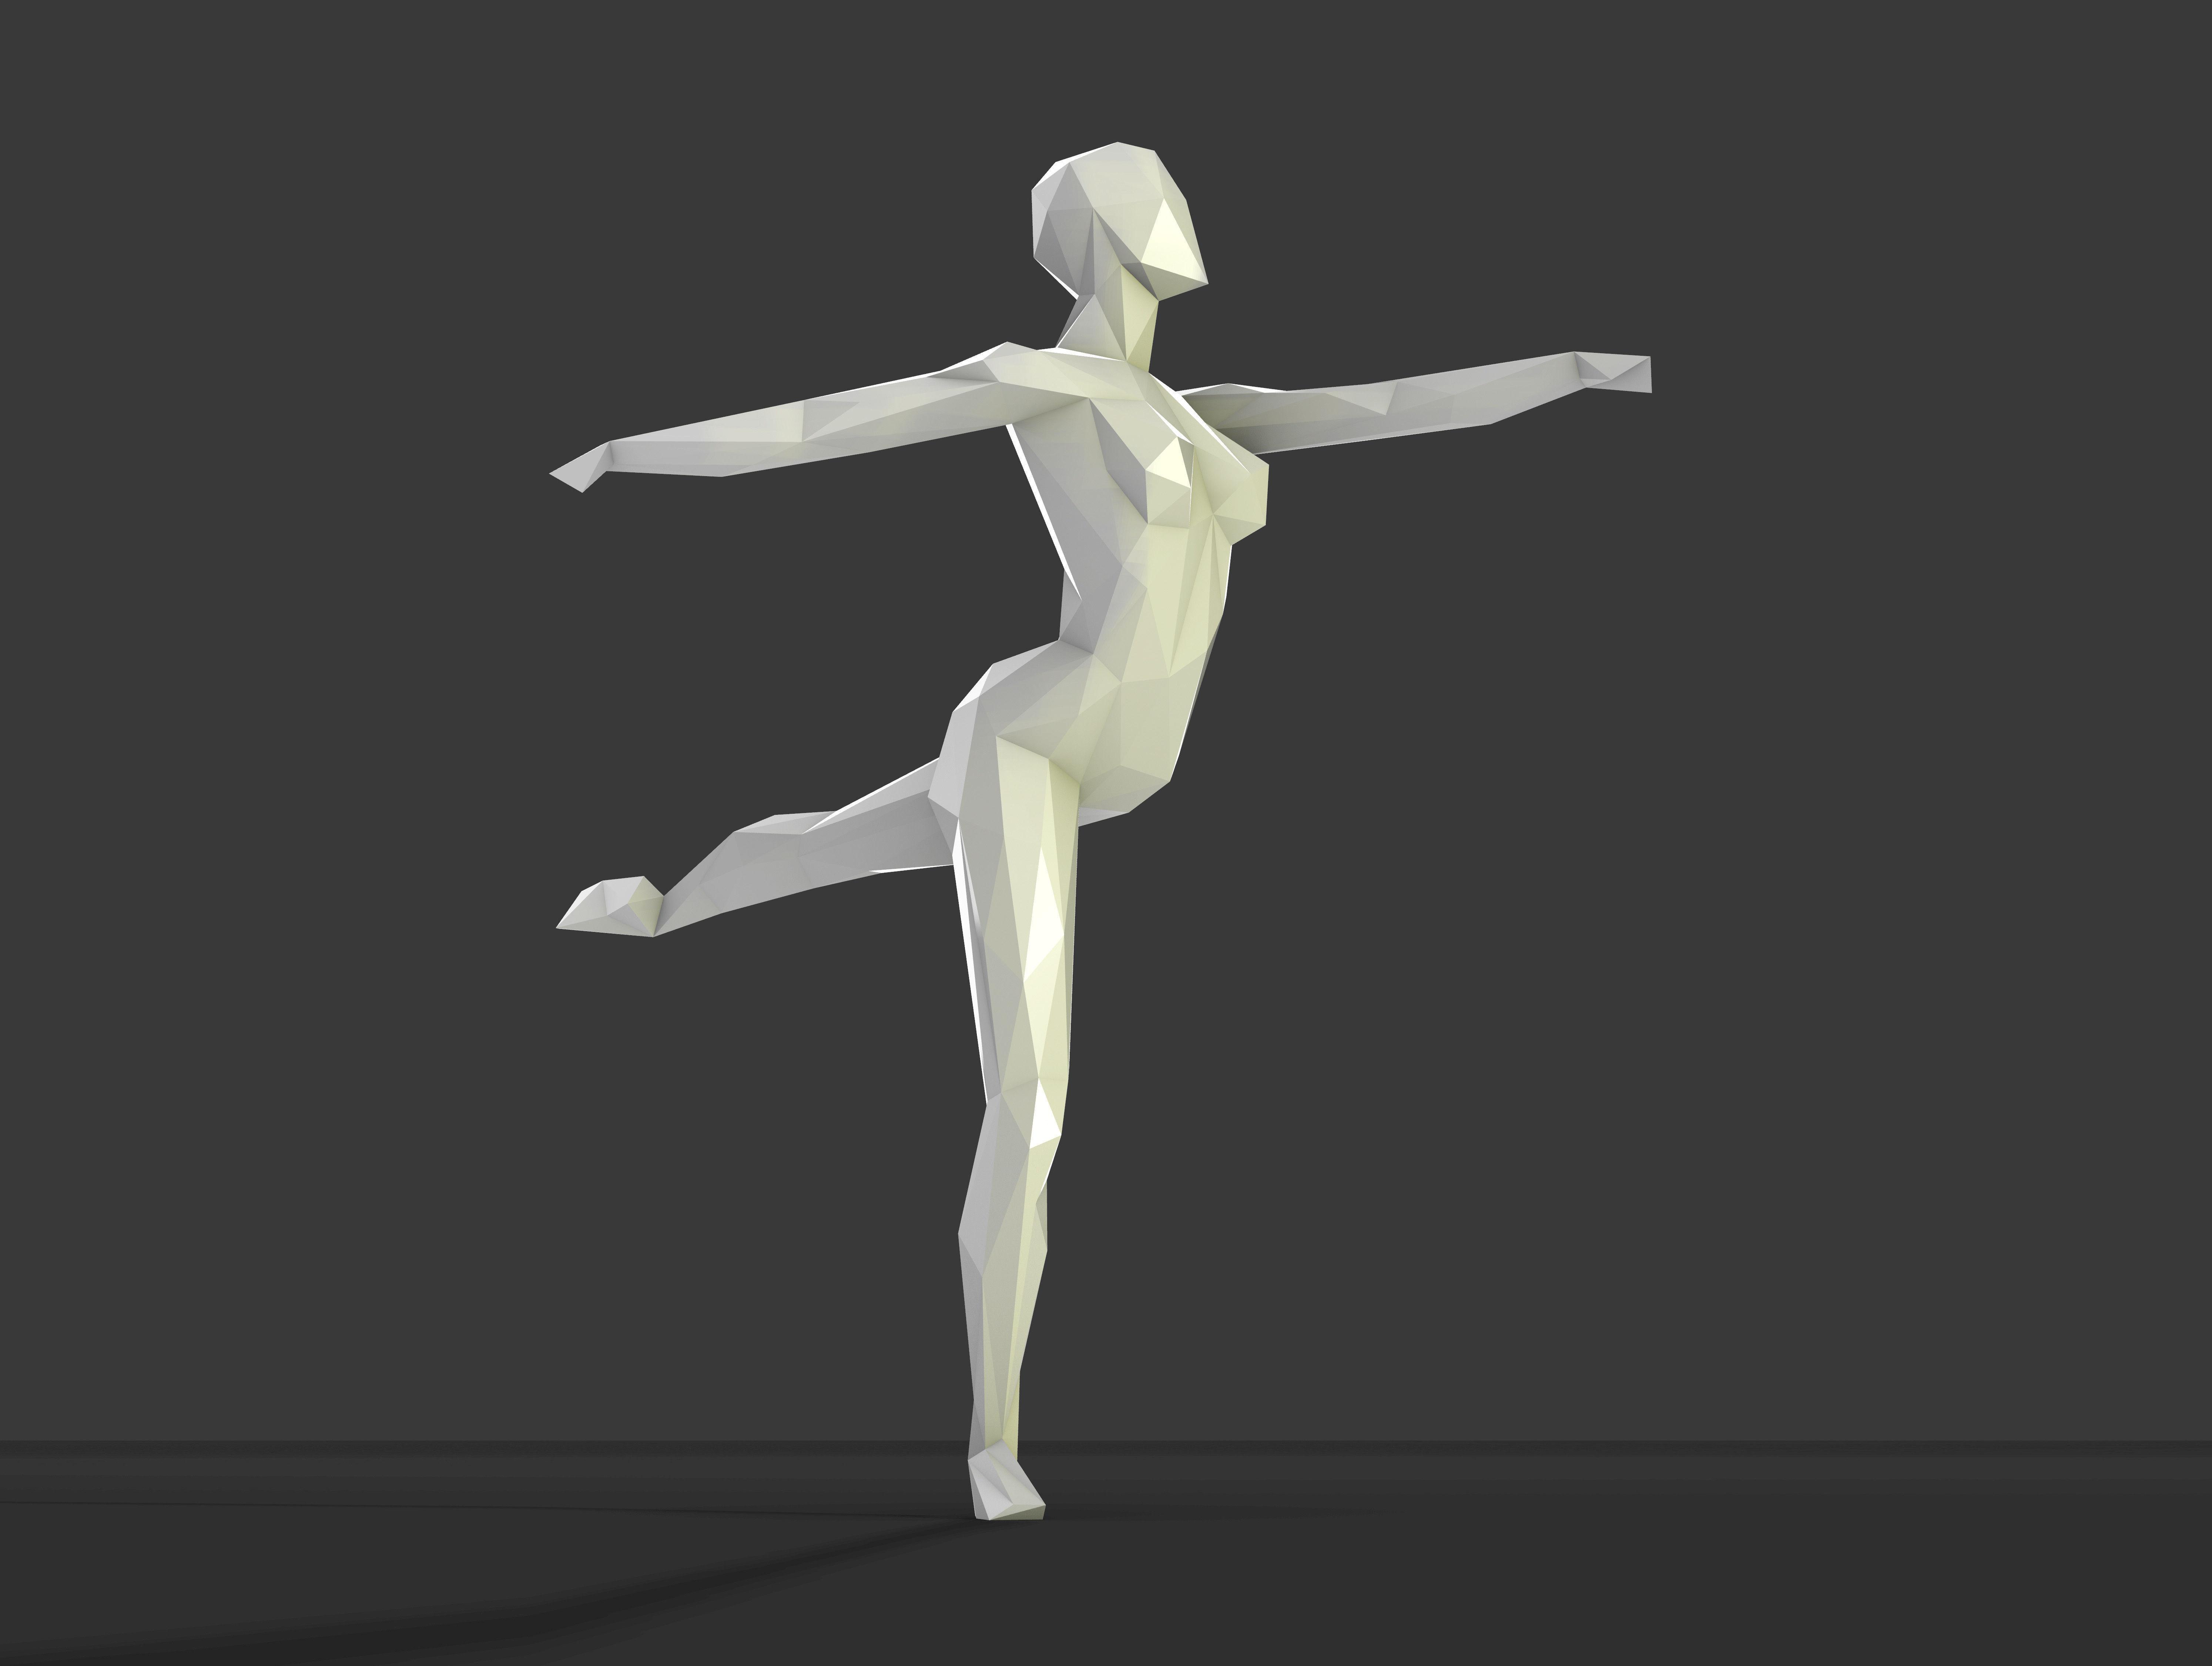 Dancing figure 2 low poly